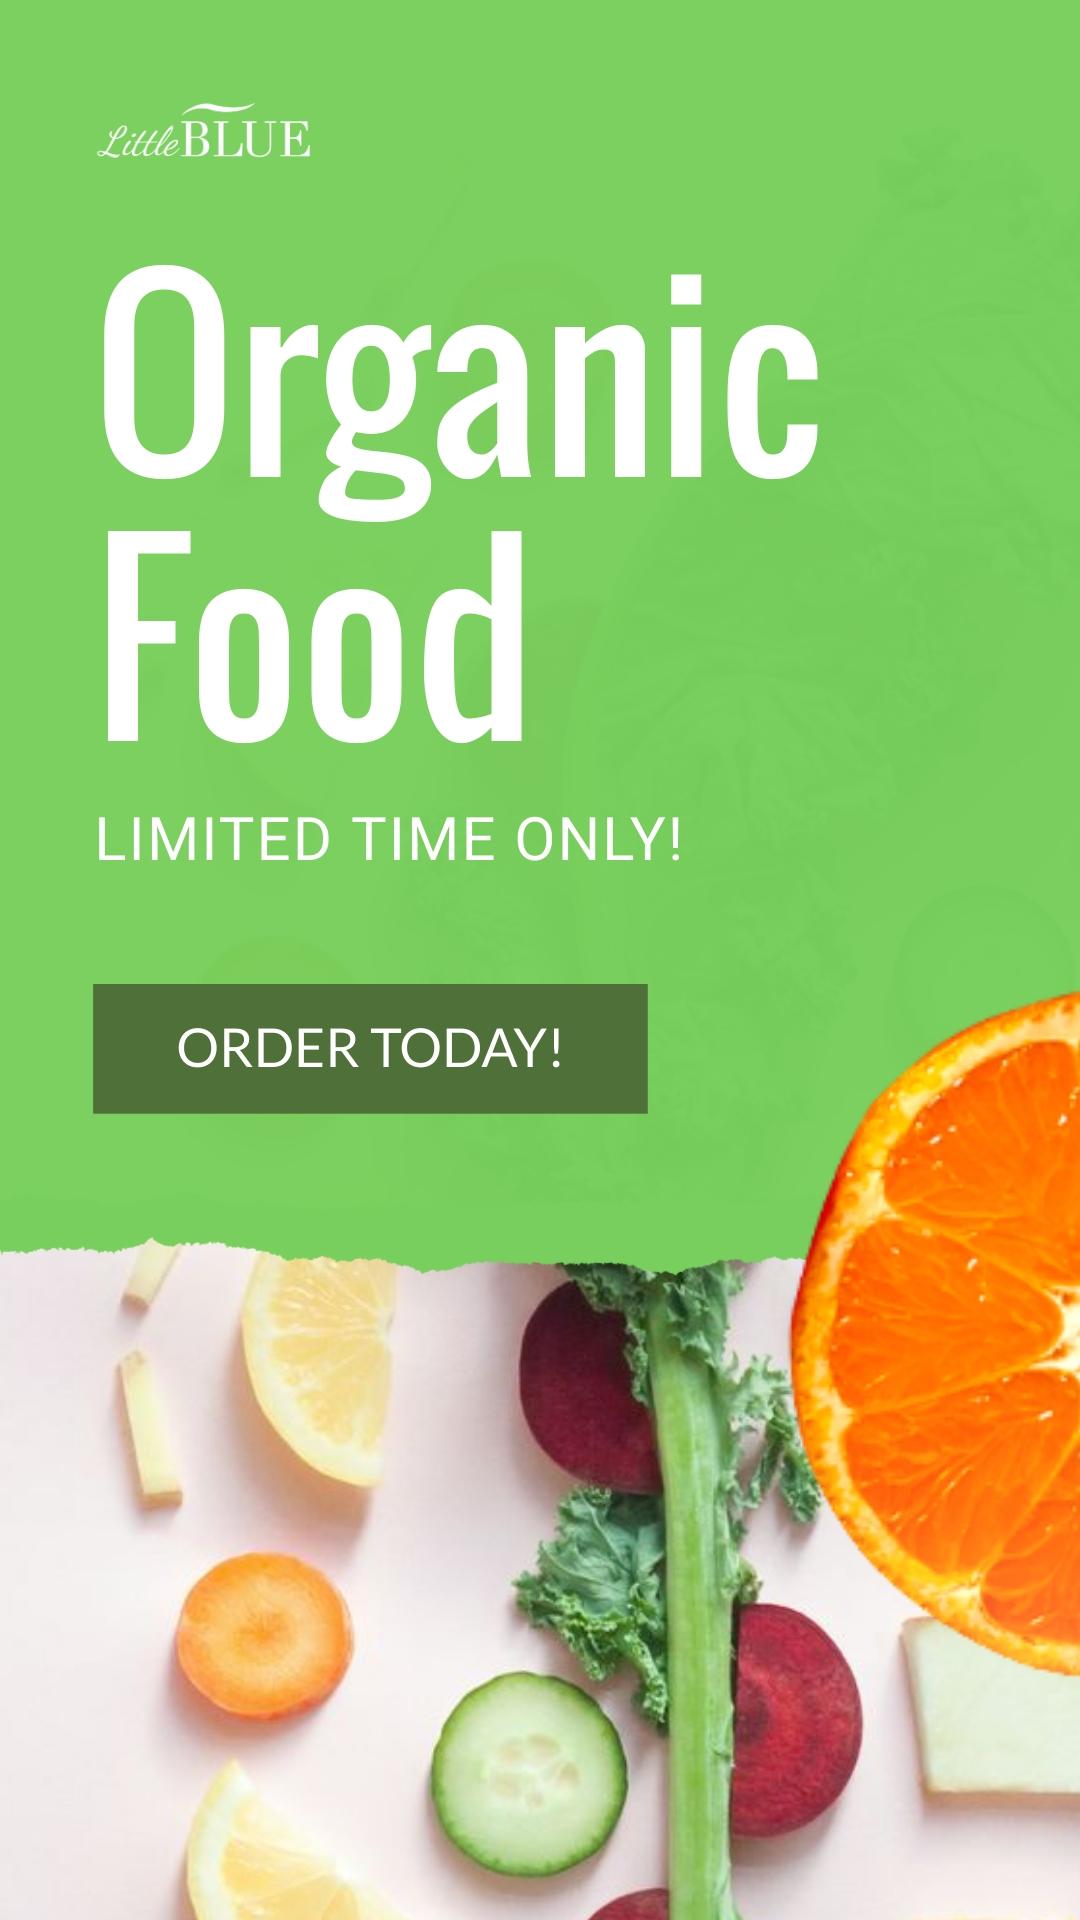 LittleBlue Organic Food Animated Vertical Template